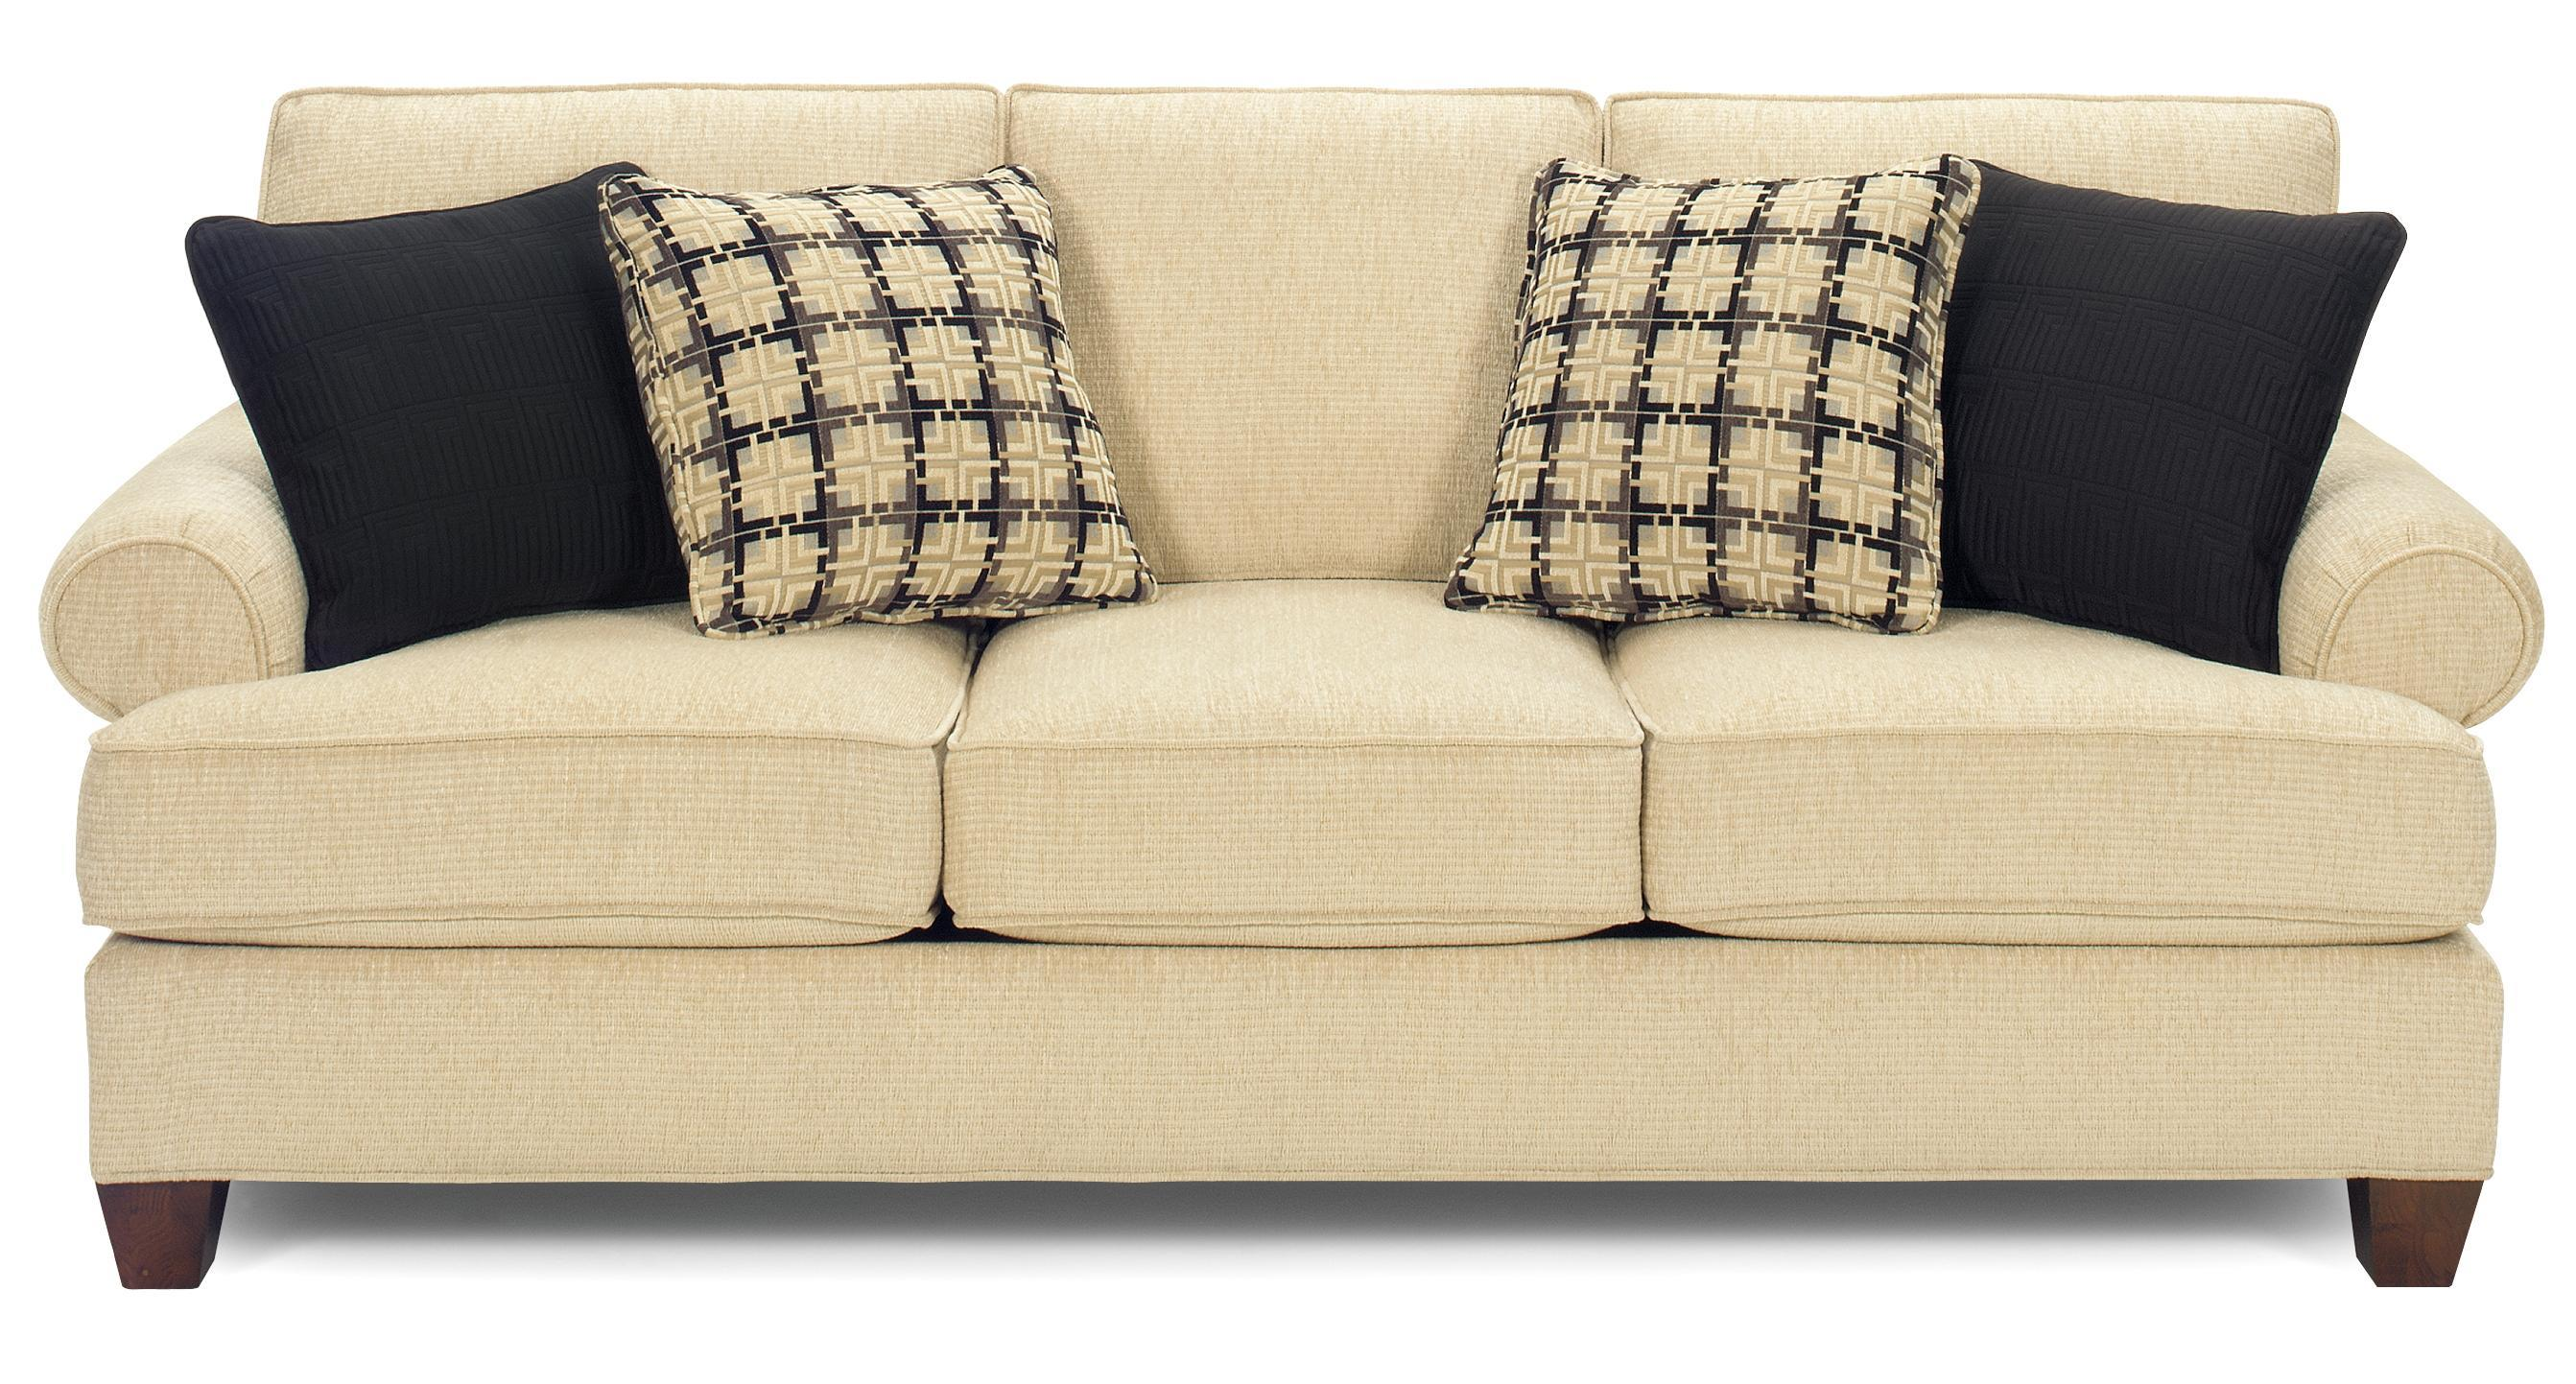 Craftmaster C9 Custom Collection b Customizable b 3 Seat Sofa